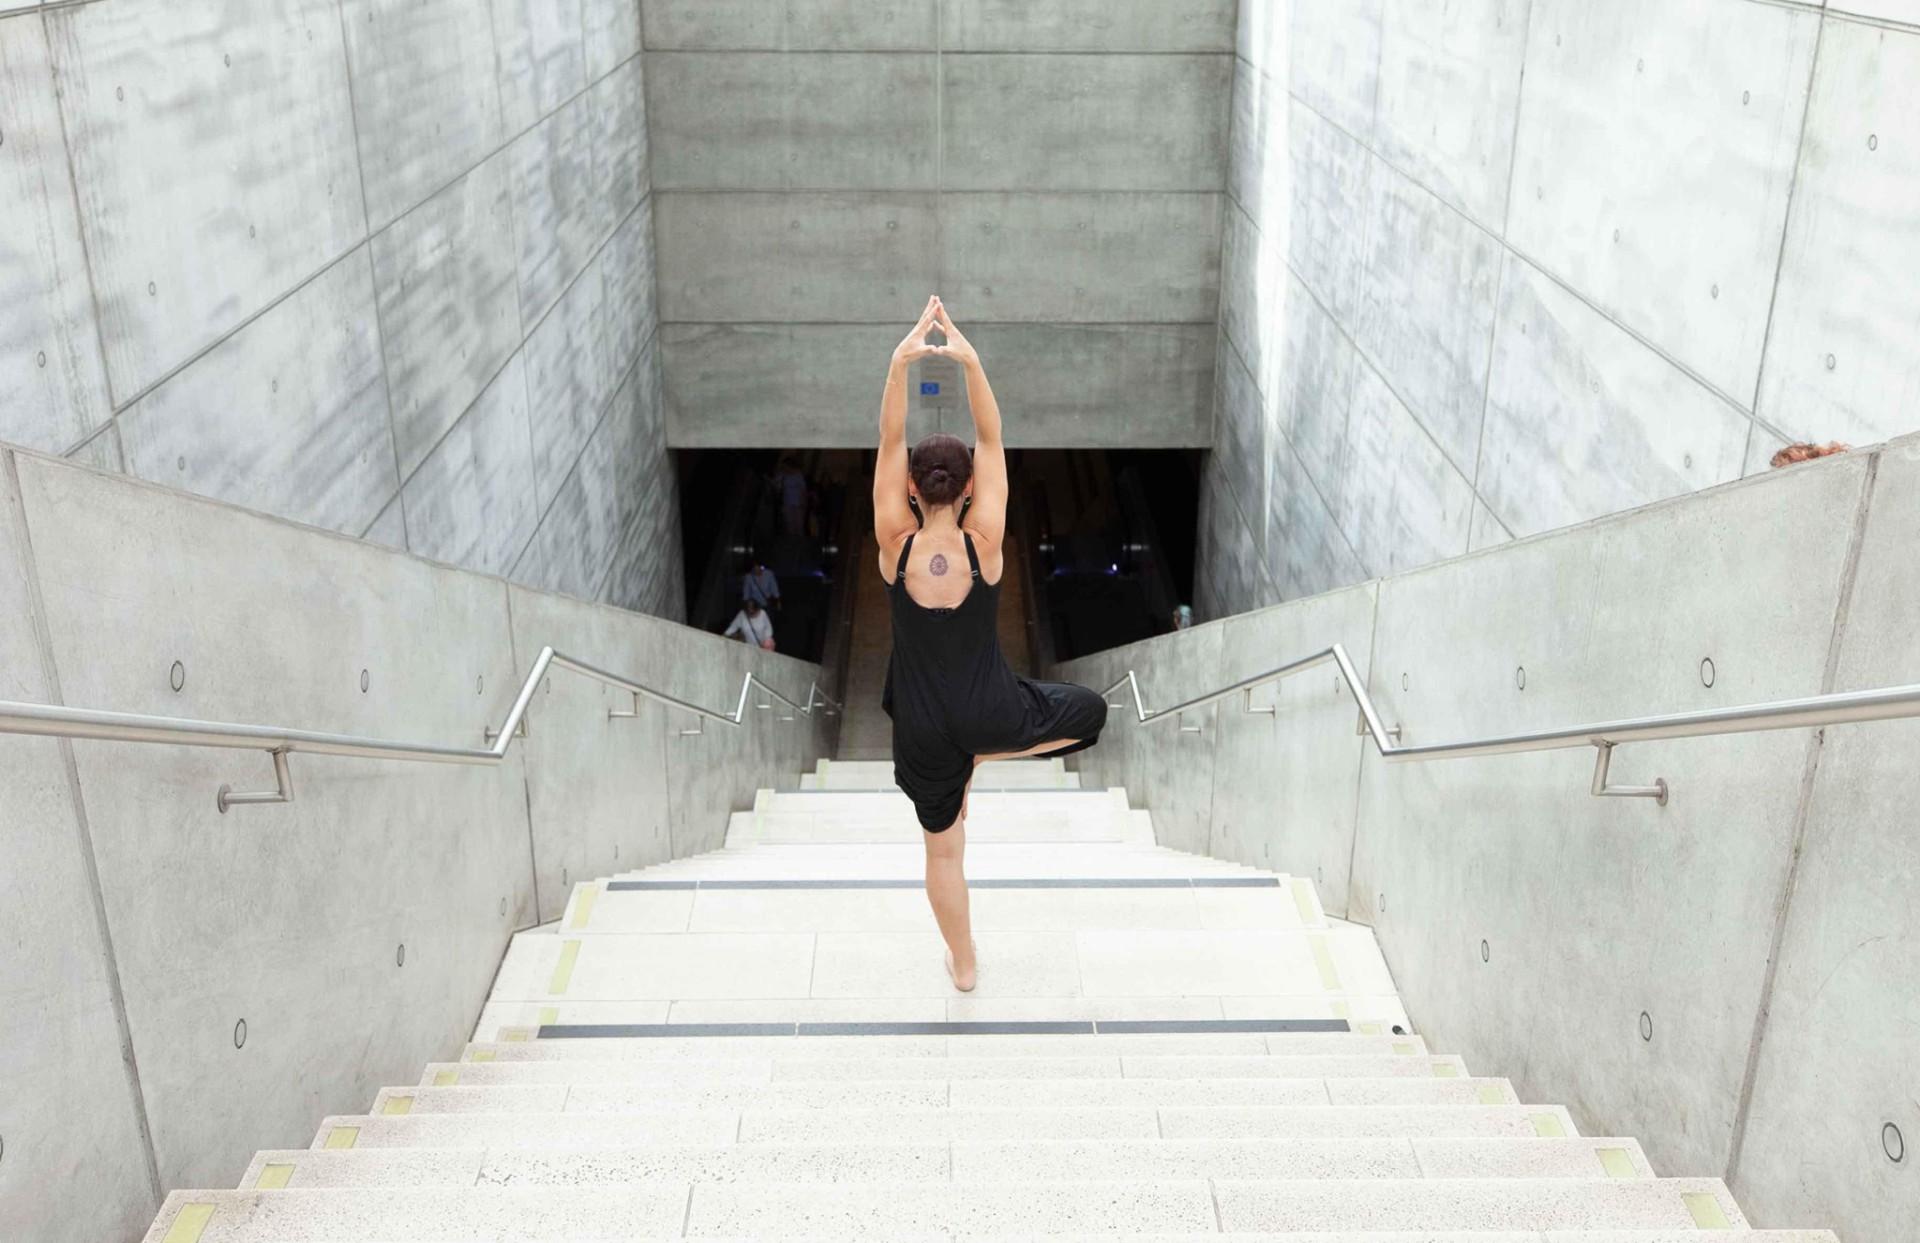 Frau in Yogapose auf einer Betontreppe.